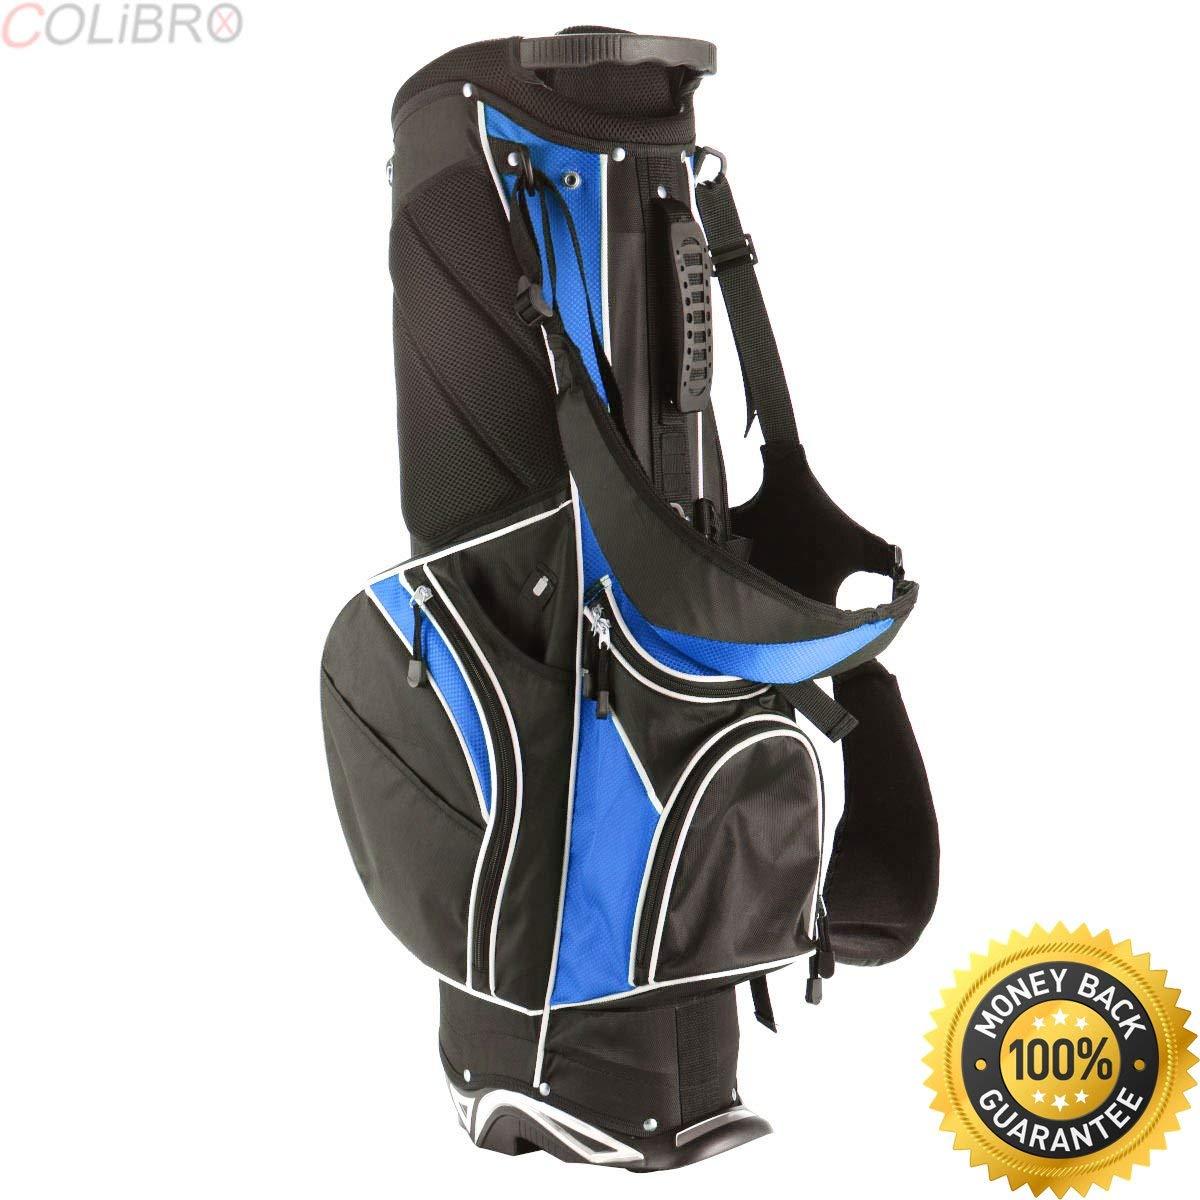 COLIBROX Golf Stand Cart Bag Club w/6 Way Divider Carry Organizer Pockets Storage Blue. hybrid golf bag. best golf cart bags 2017. best sun mountain golf sync cart bag amazon. blue golf cart bags.